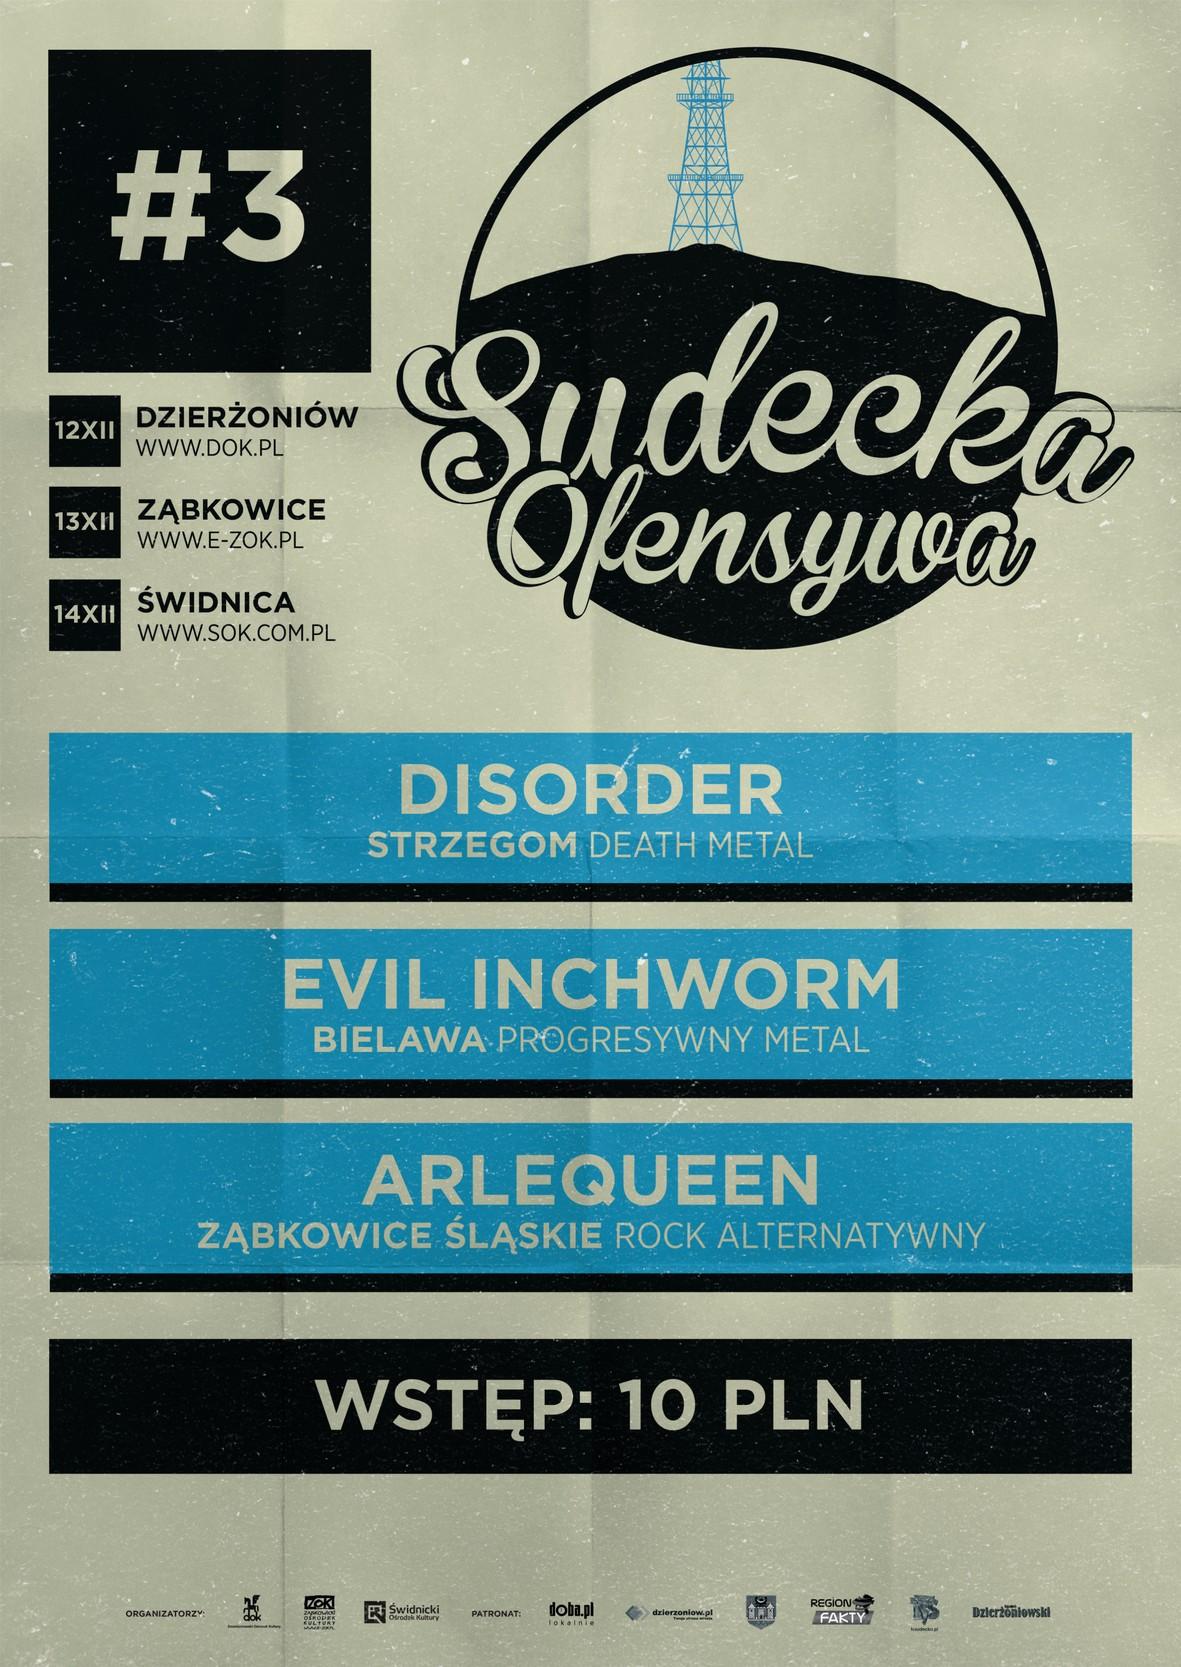 Sudecka Ofensywa: Disorder + Evil Inchworm + Arlequeen